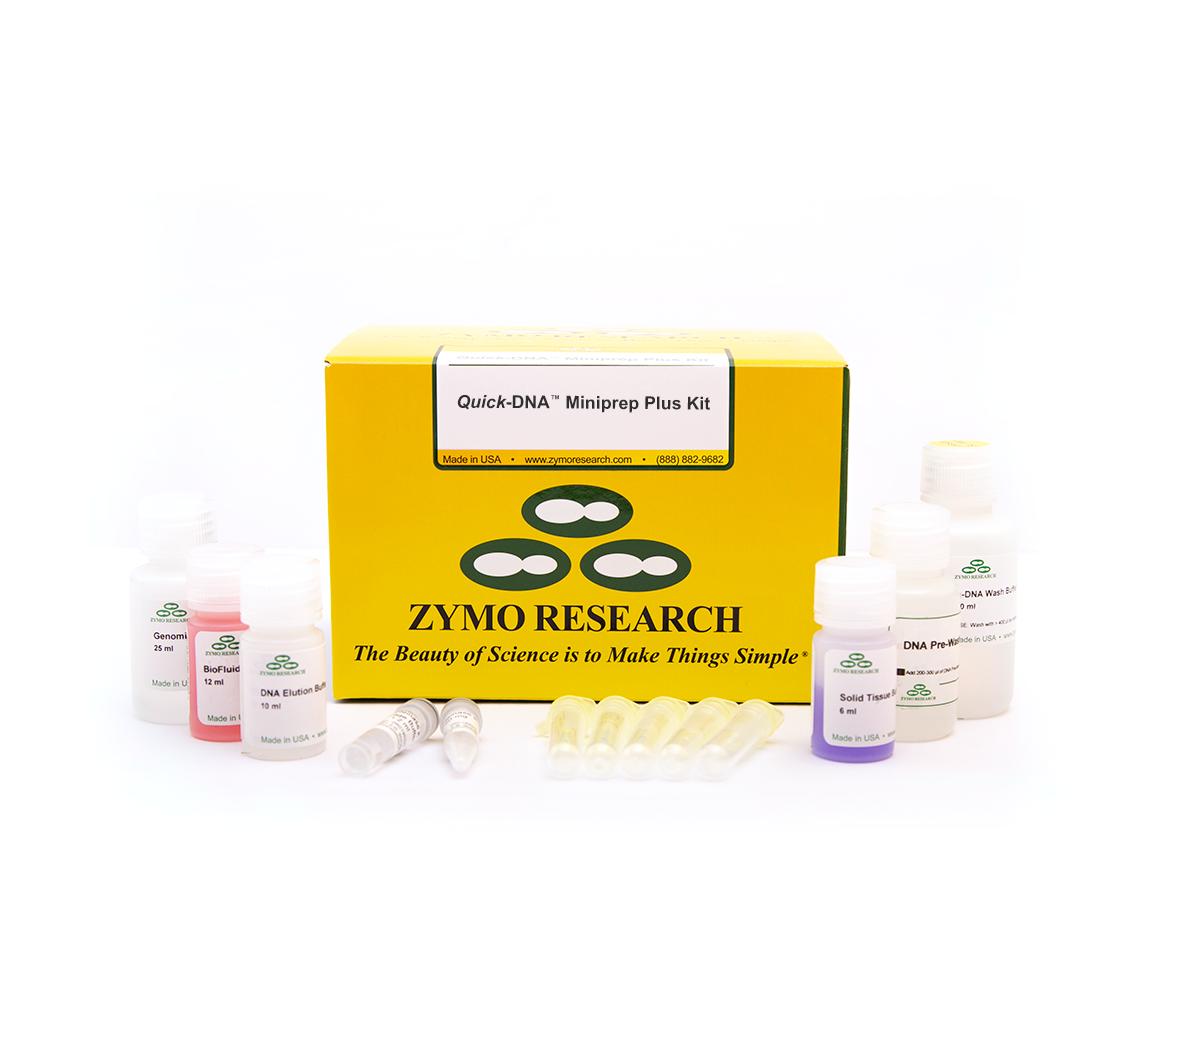 Quick-DNA Kits